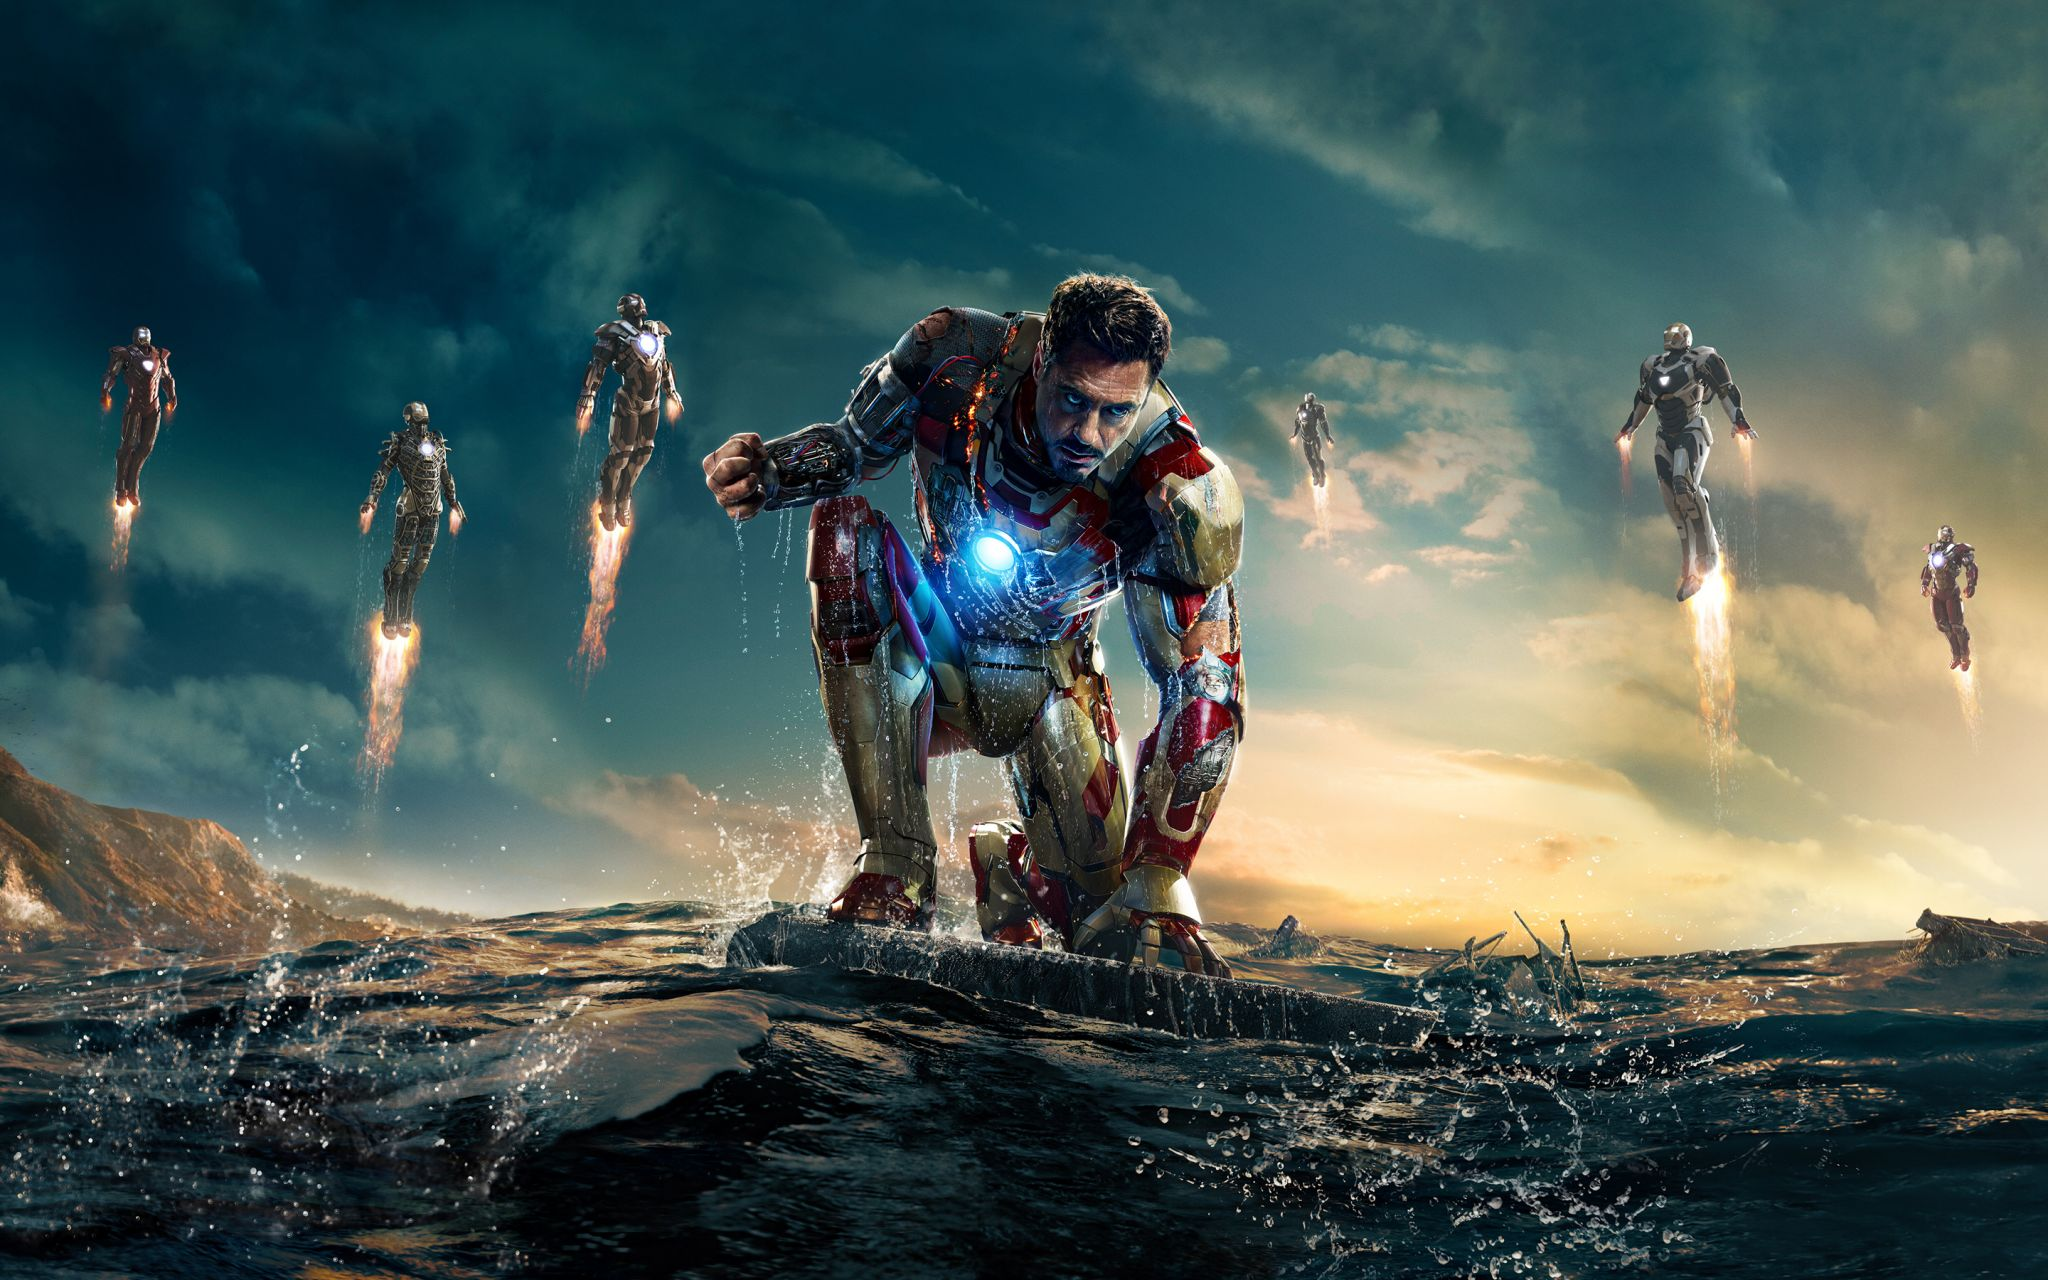 hinh-anh-sieu-anh-hung-the-avengers-Super-hero-nguoi-sat